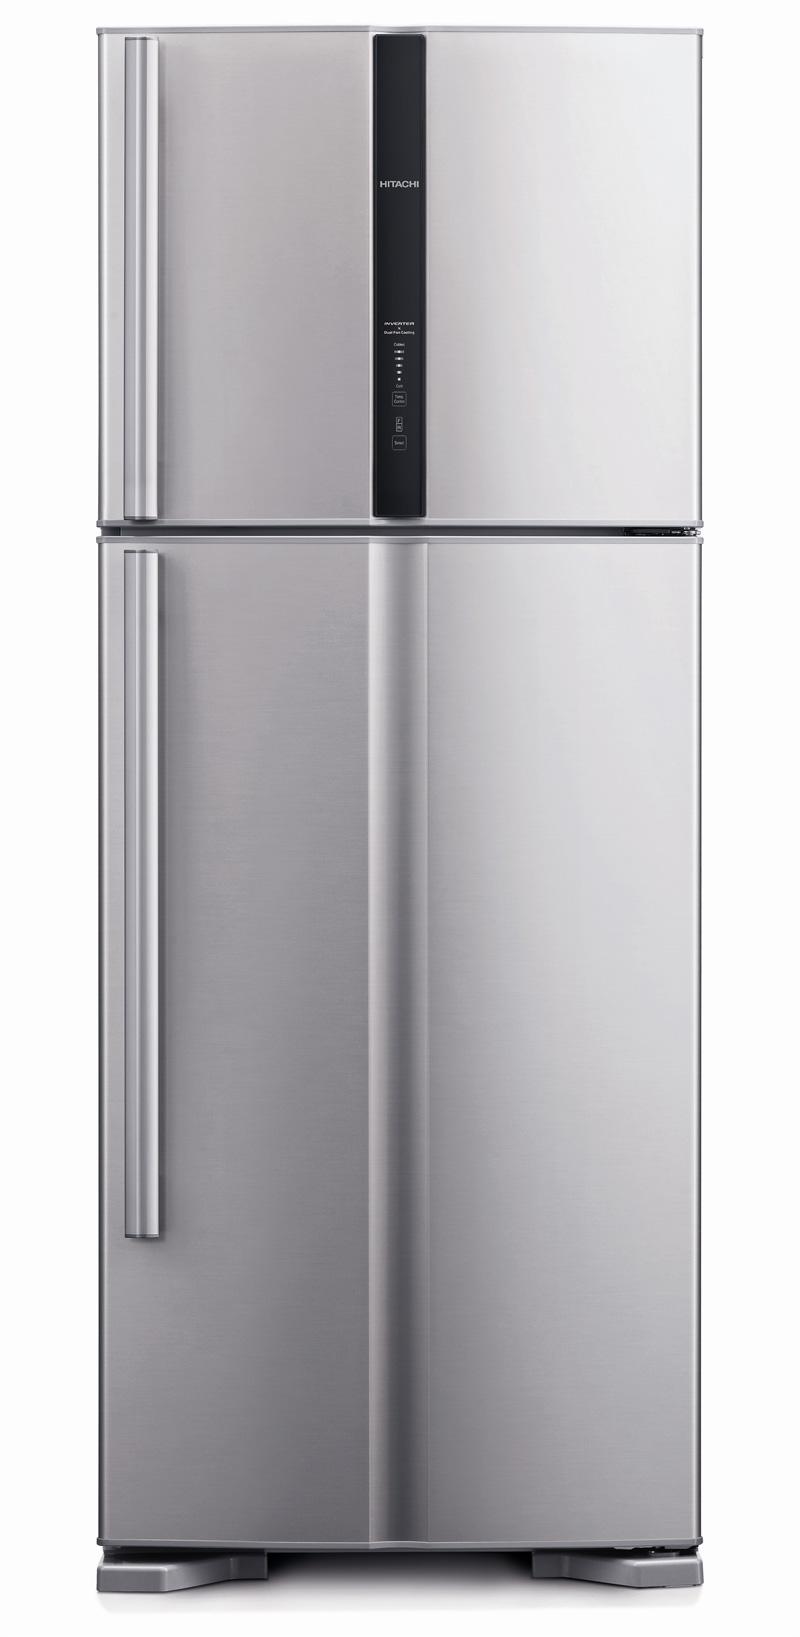 Hitachi Refrigerator  H-RV540PG3SLS